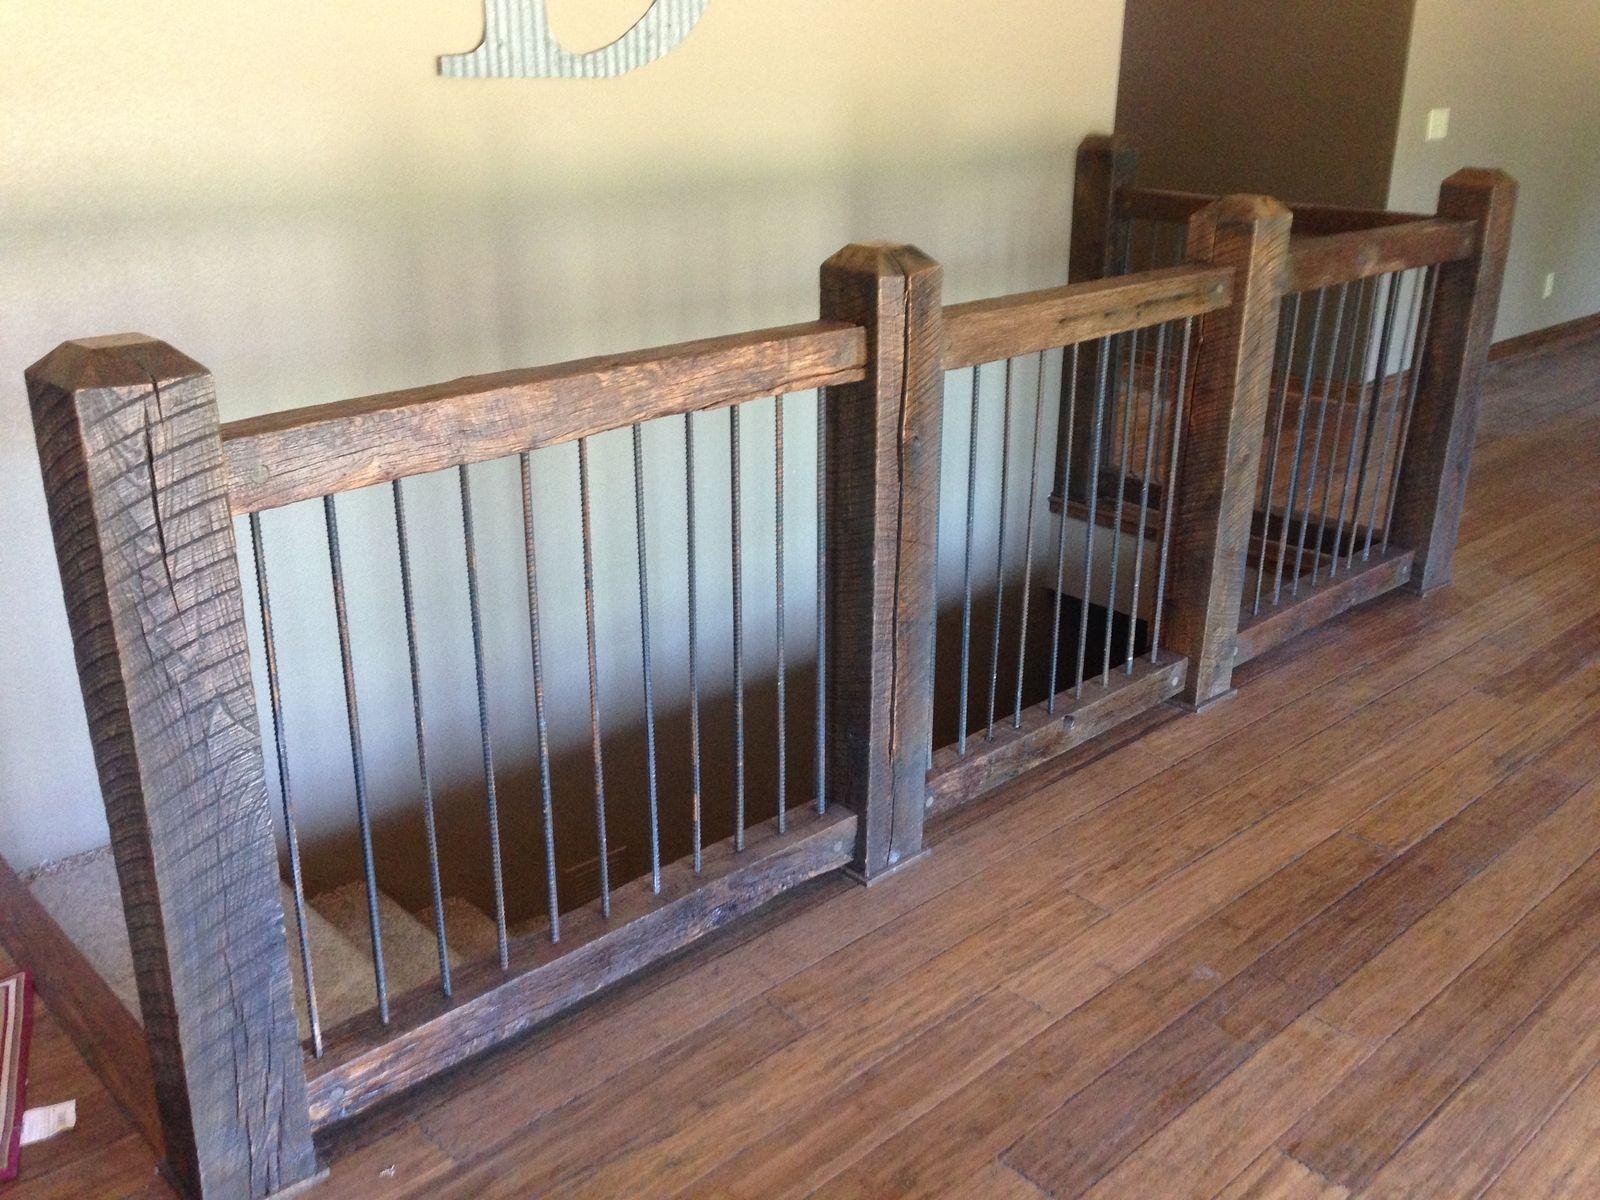 Reclaimed Stair Railings Rustic Stairs Loft Railing Farmhouse   Rustic Stairs And Railings   Handrail   Custom   Design   Cabin   Interior